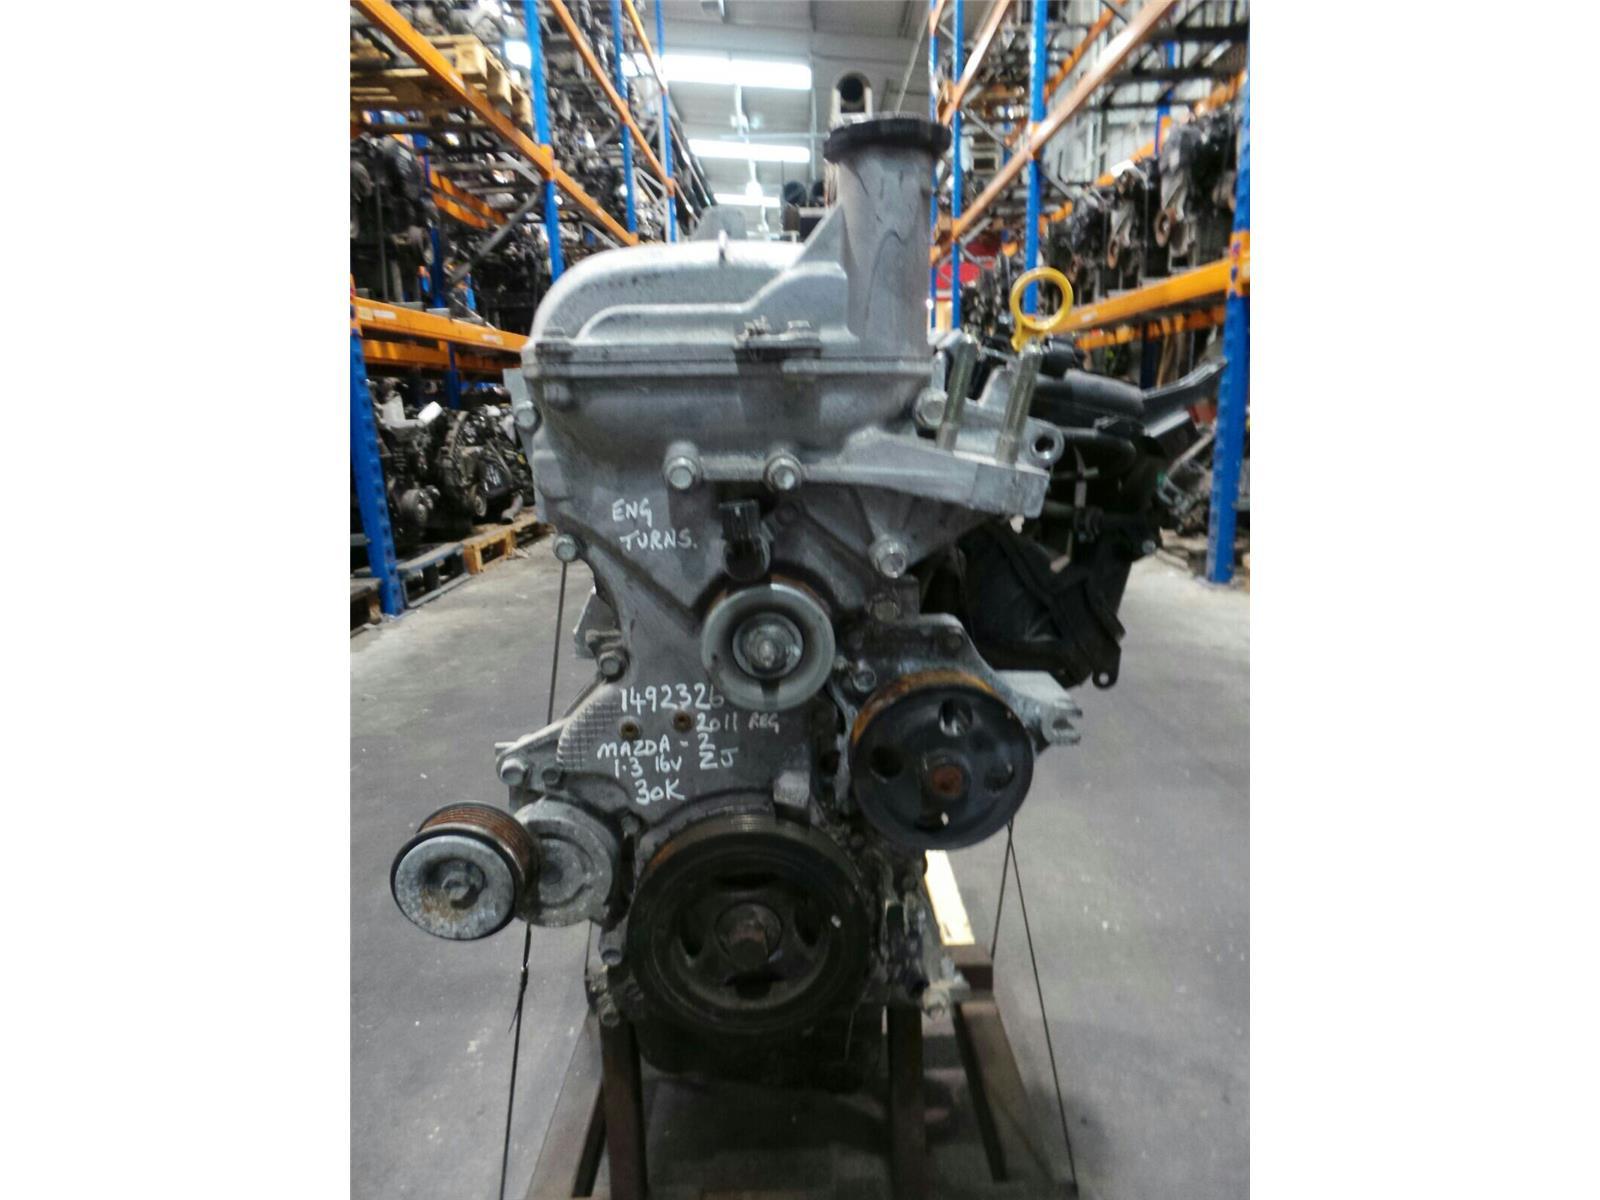 hight resolution of  engine 2008 15 mazda 2 1 3 petrol engine zj 30k miles warranty 5108163